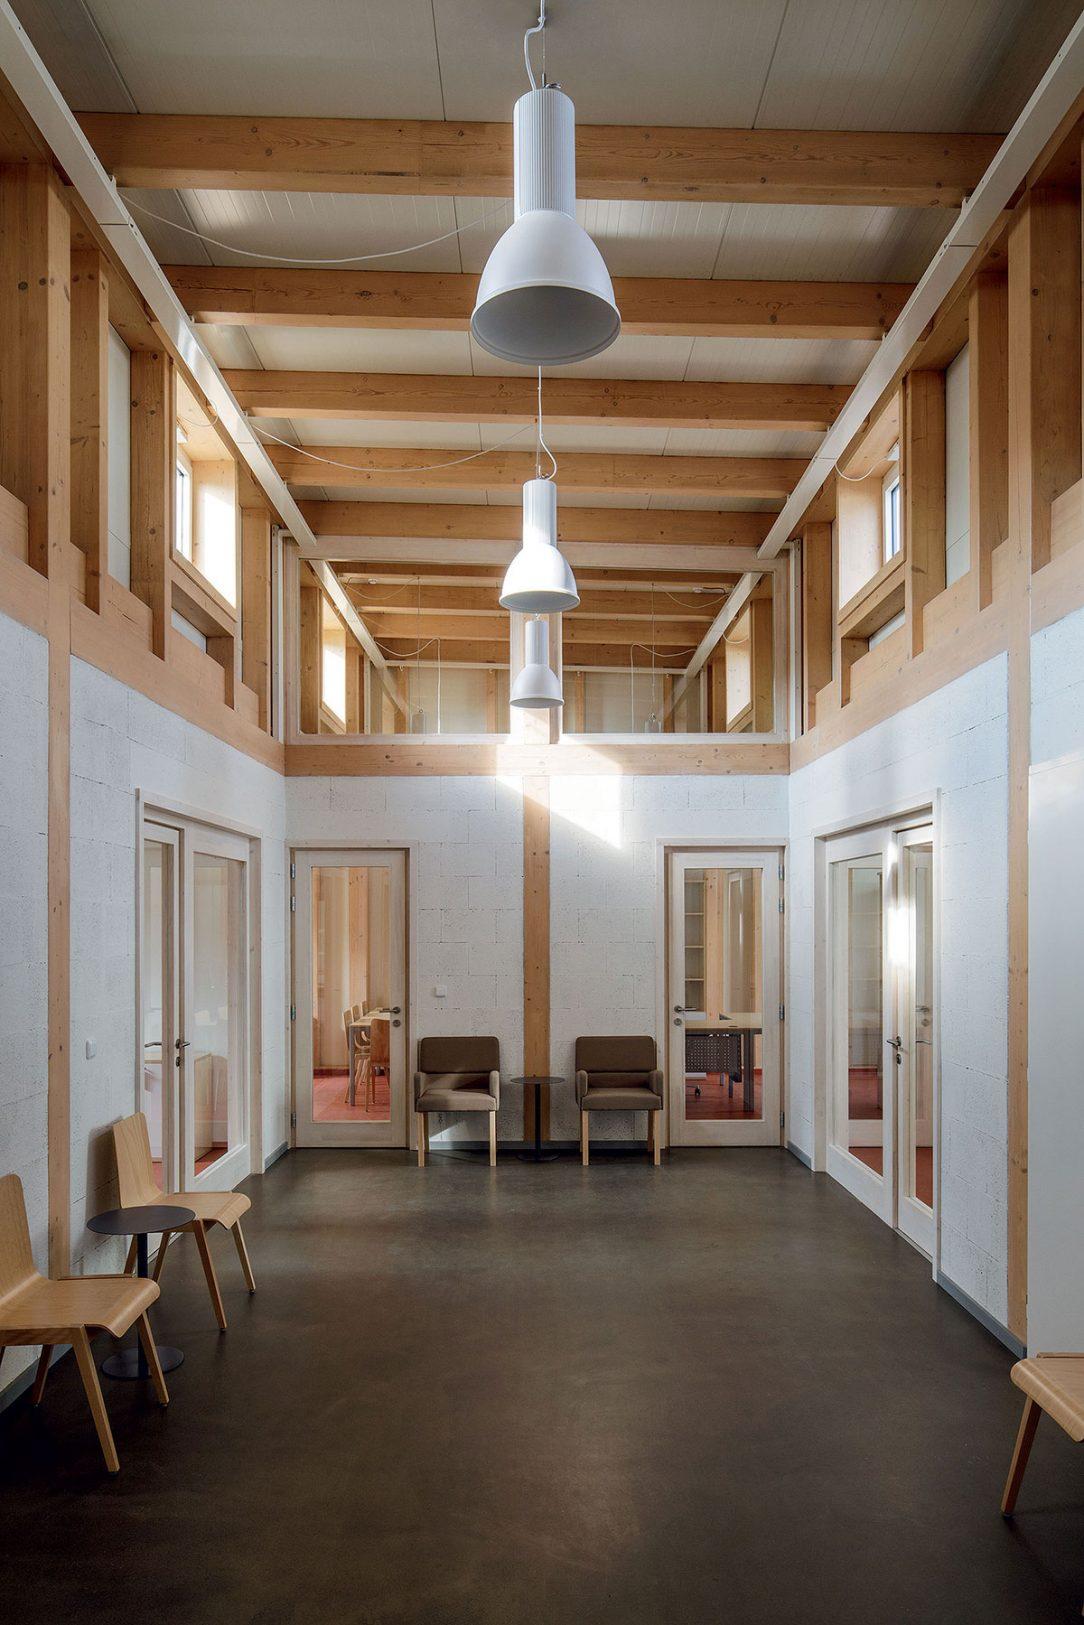 Jednoduchá architektura interiéru využívá dřevo bílou barvu a strukturu liaporových tvárnic.